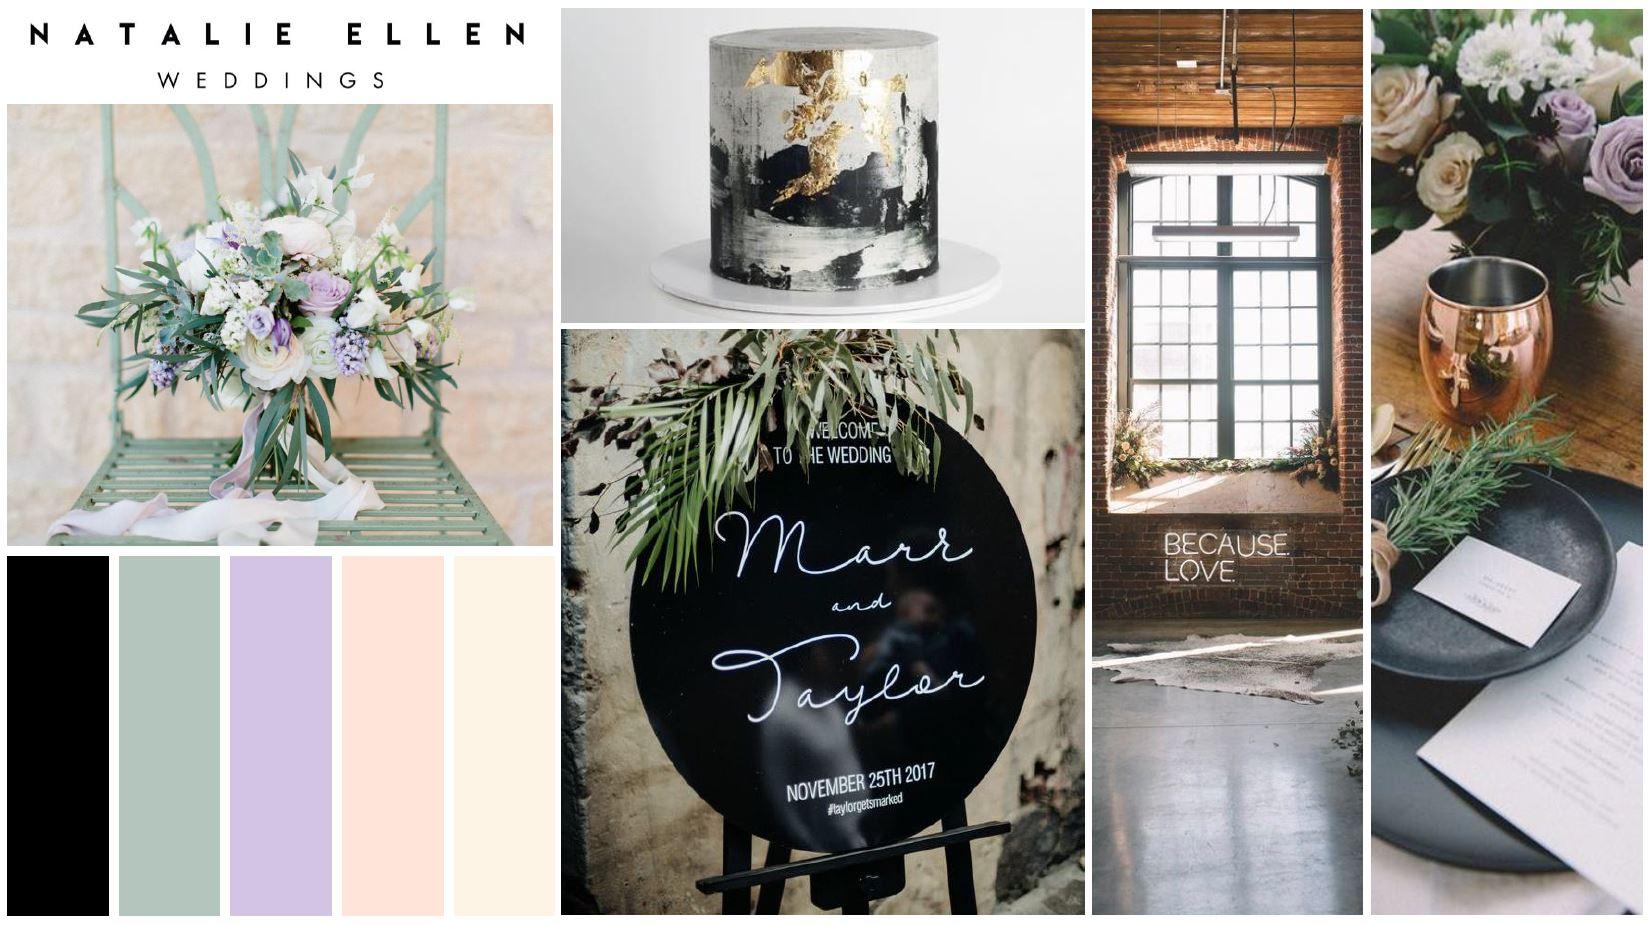 Natalie Ellen Weddings moodboard to define wedding style